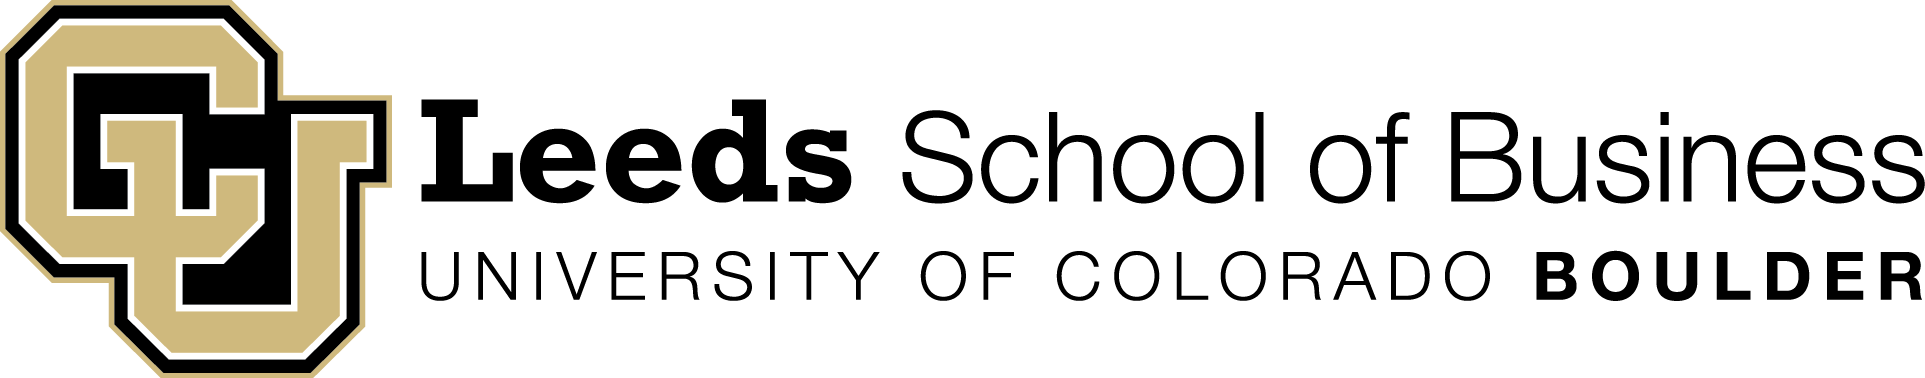 8c776ed0-b9e8-41e0-9844-fd6e21262369.png